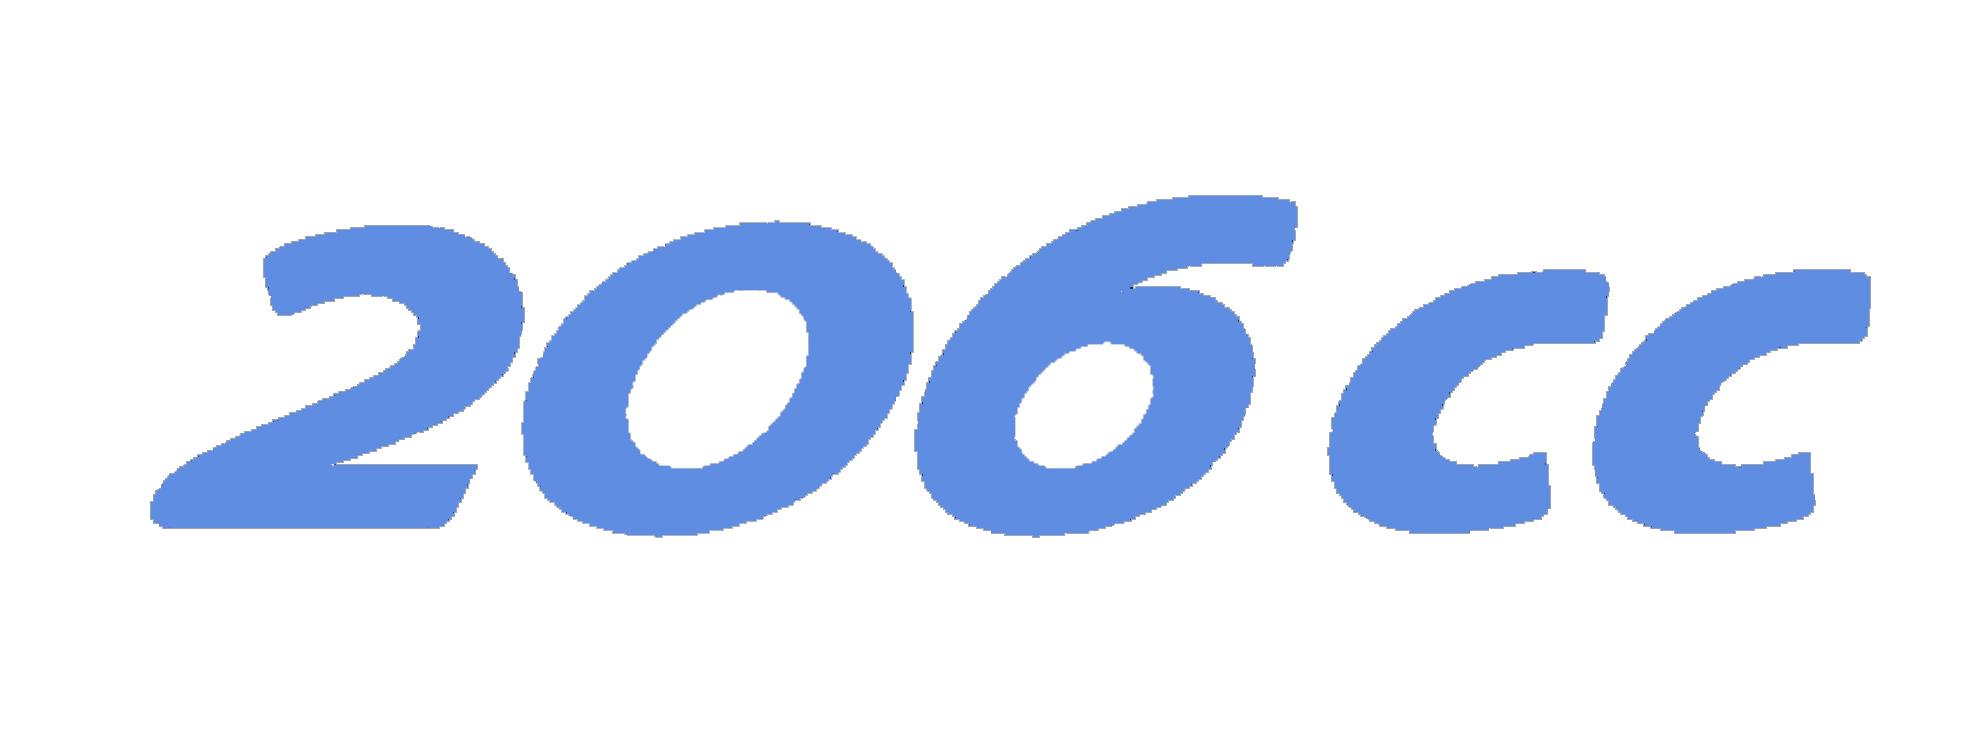 206cc blue on silverjpg